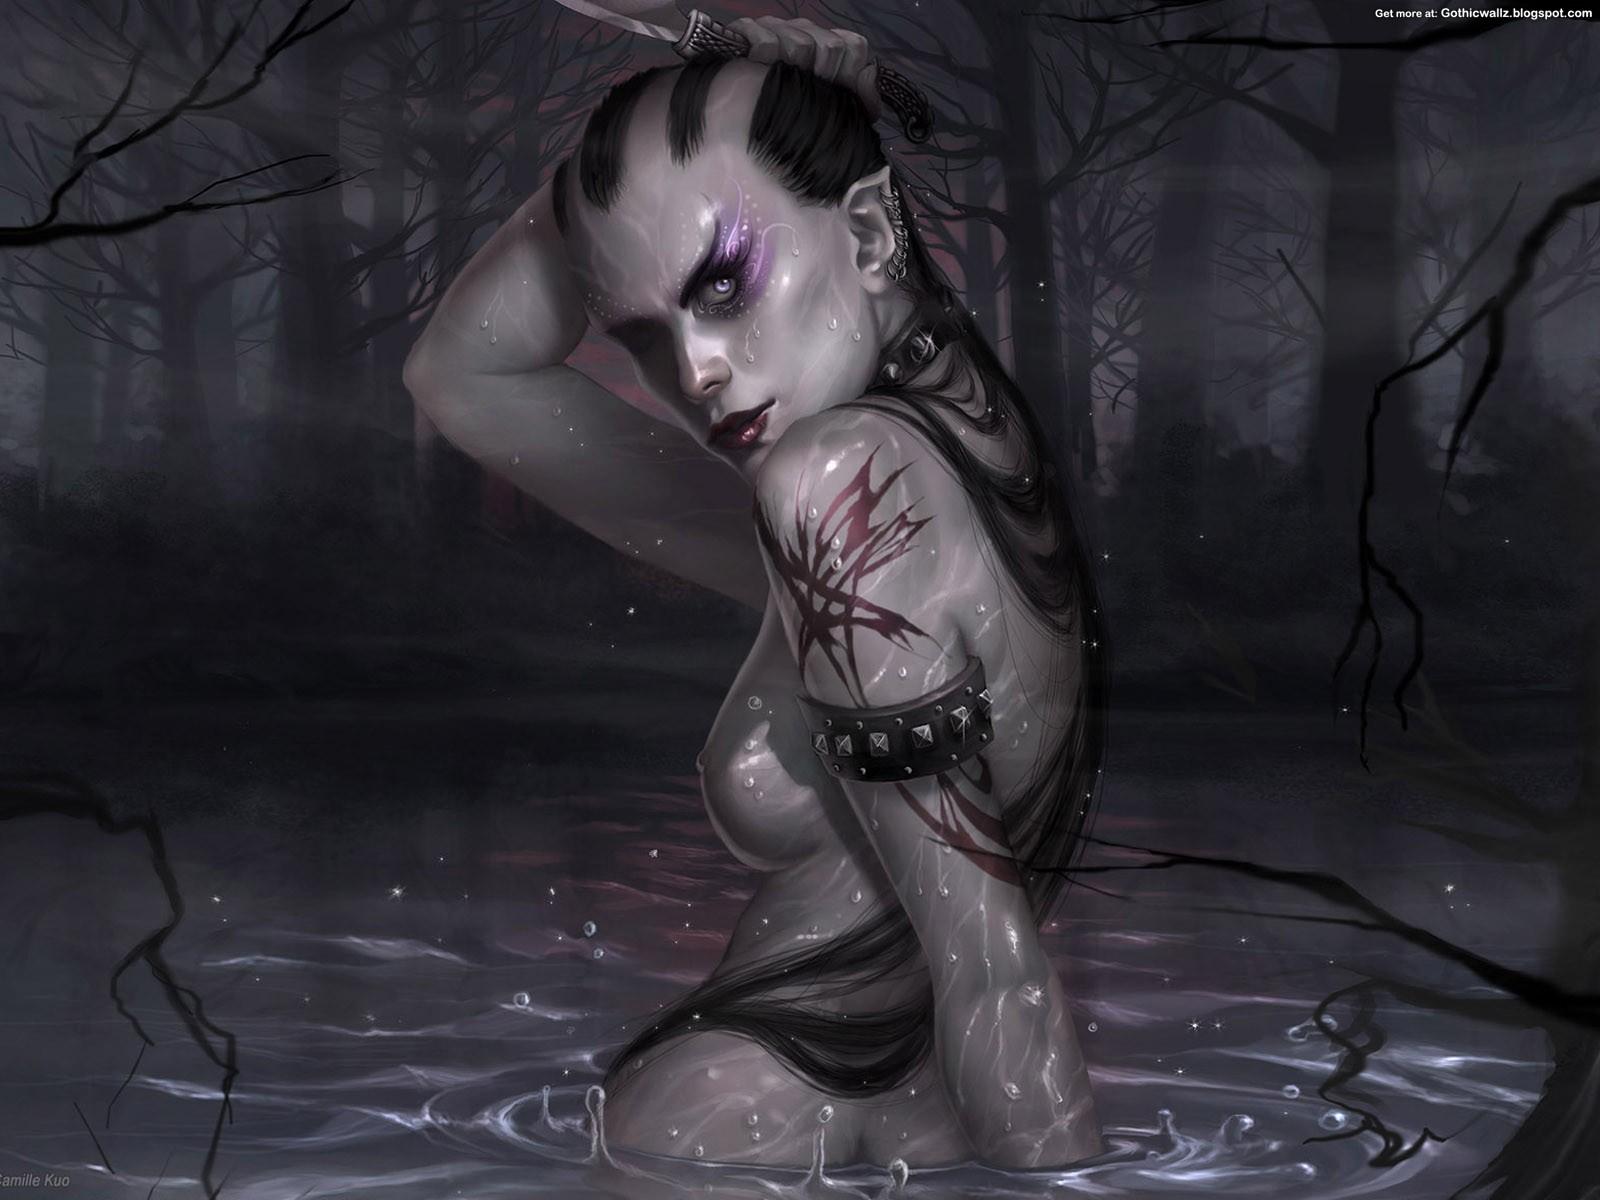 http://3.bp.blogspot.com/_-jo2ZCYhKaY/SimiAlrVyHI/AAAAAAAAB_8/5mn5OdQqwIw/s1600/Gothicwallz--Gothic-Wallpaper-180.jpg